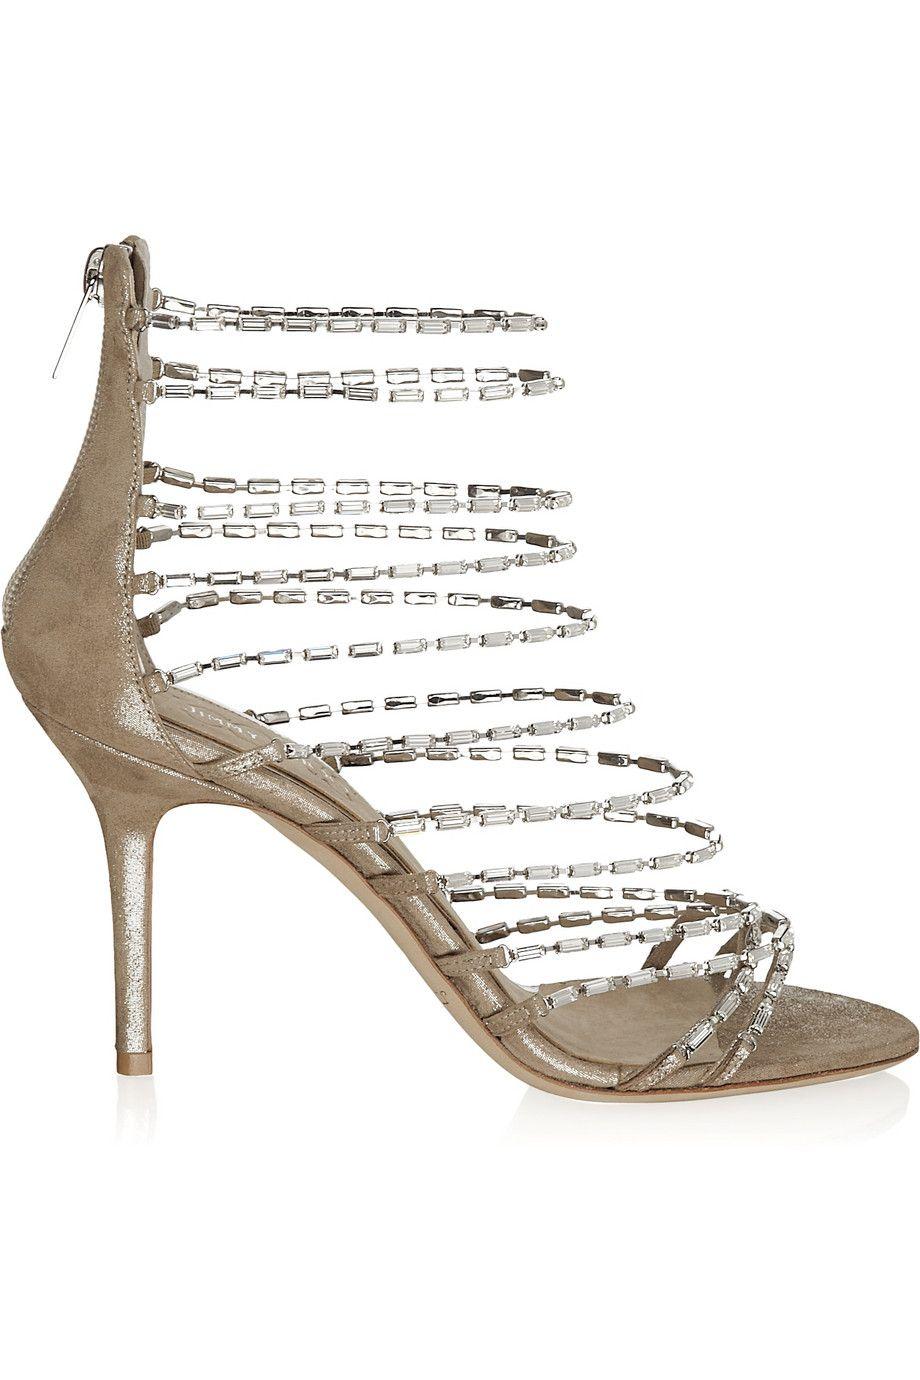 suede sandals   Jimmy Choo   Jimmy choo